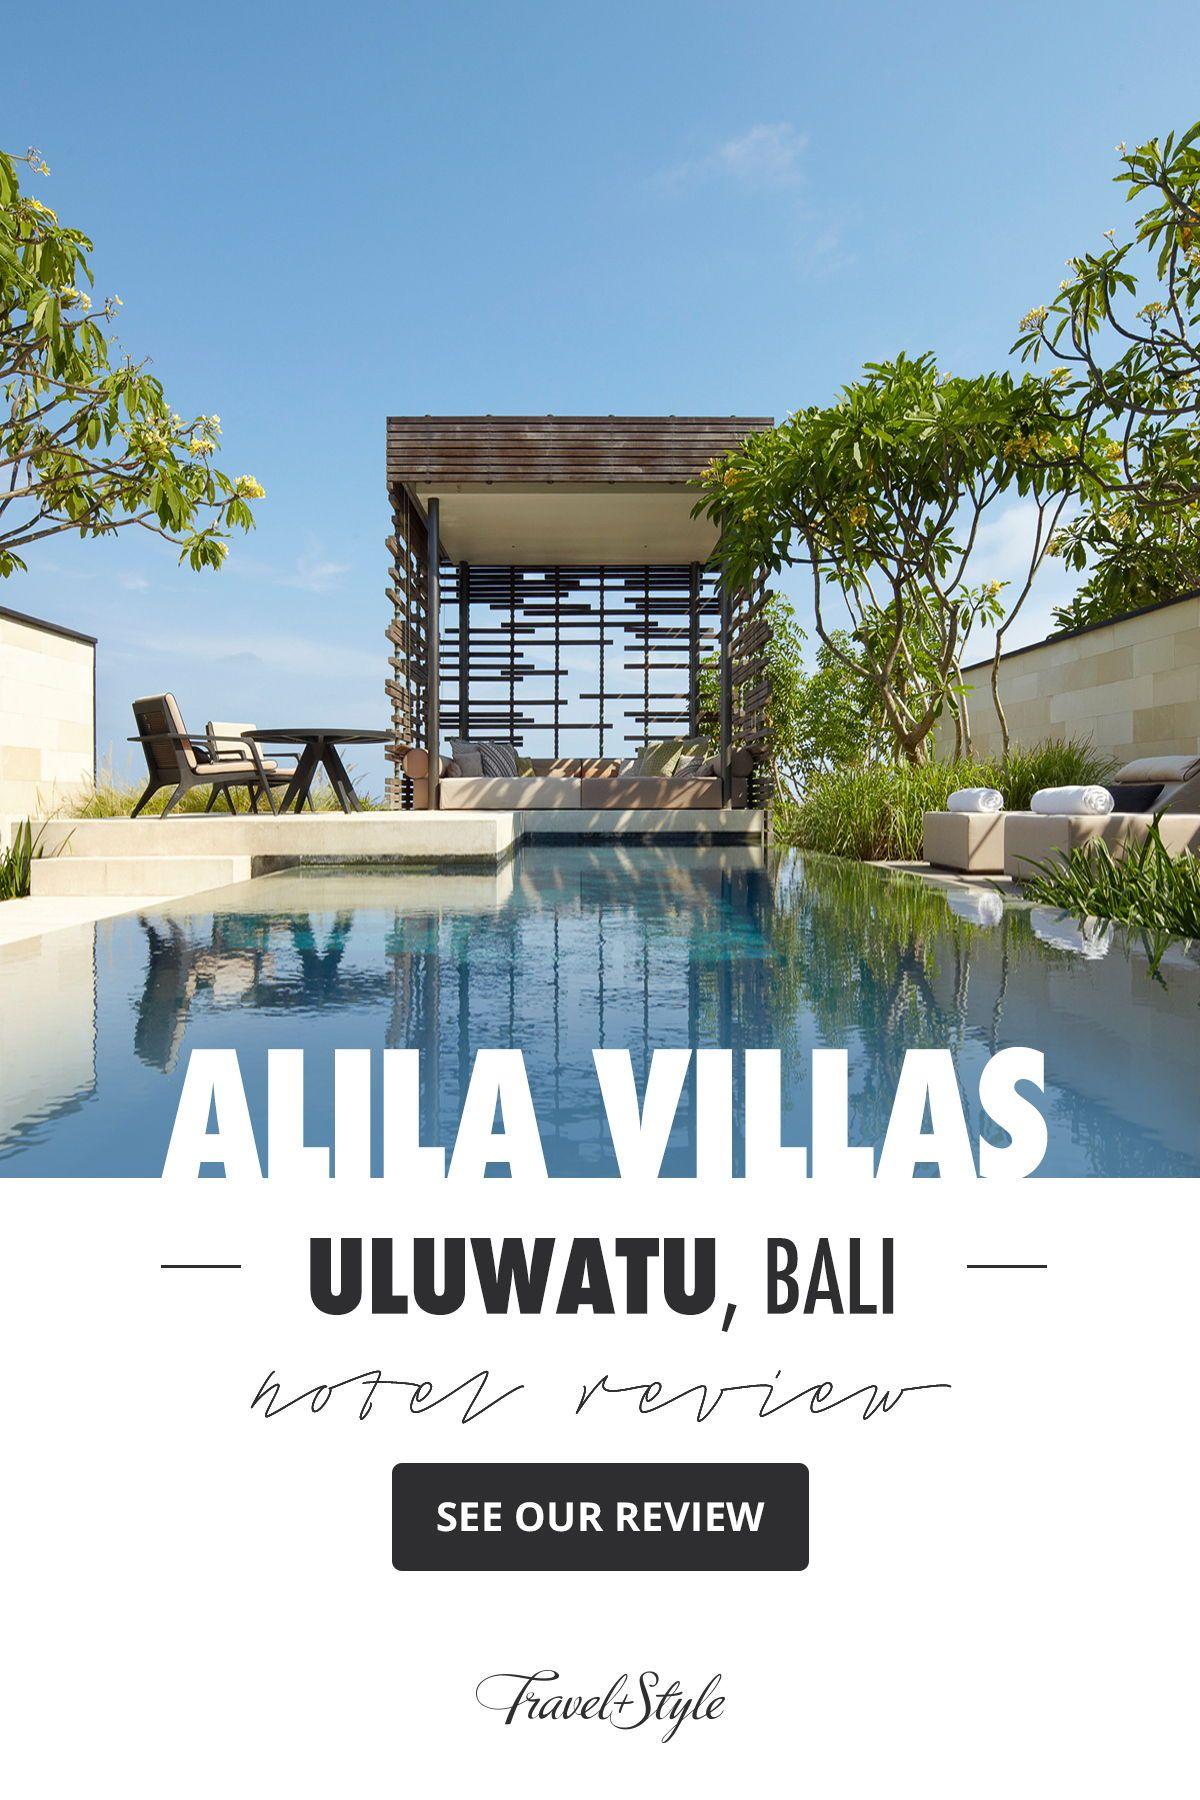 Alila Villas Uluwatu Bali Indonesia Luxury Hotel Review By Travelplusstyle Alila Villas Uluwatu Ubud Bali Hotels Luxury Hotels Bali